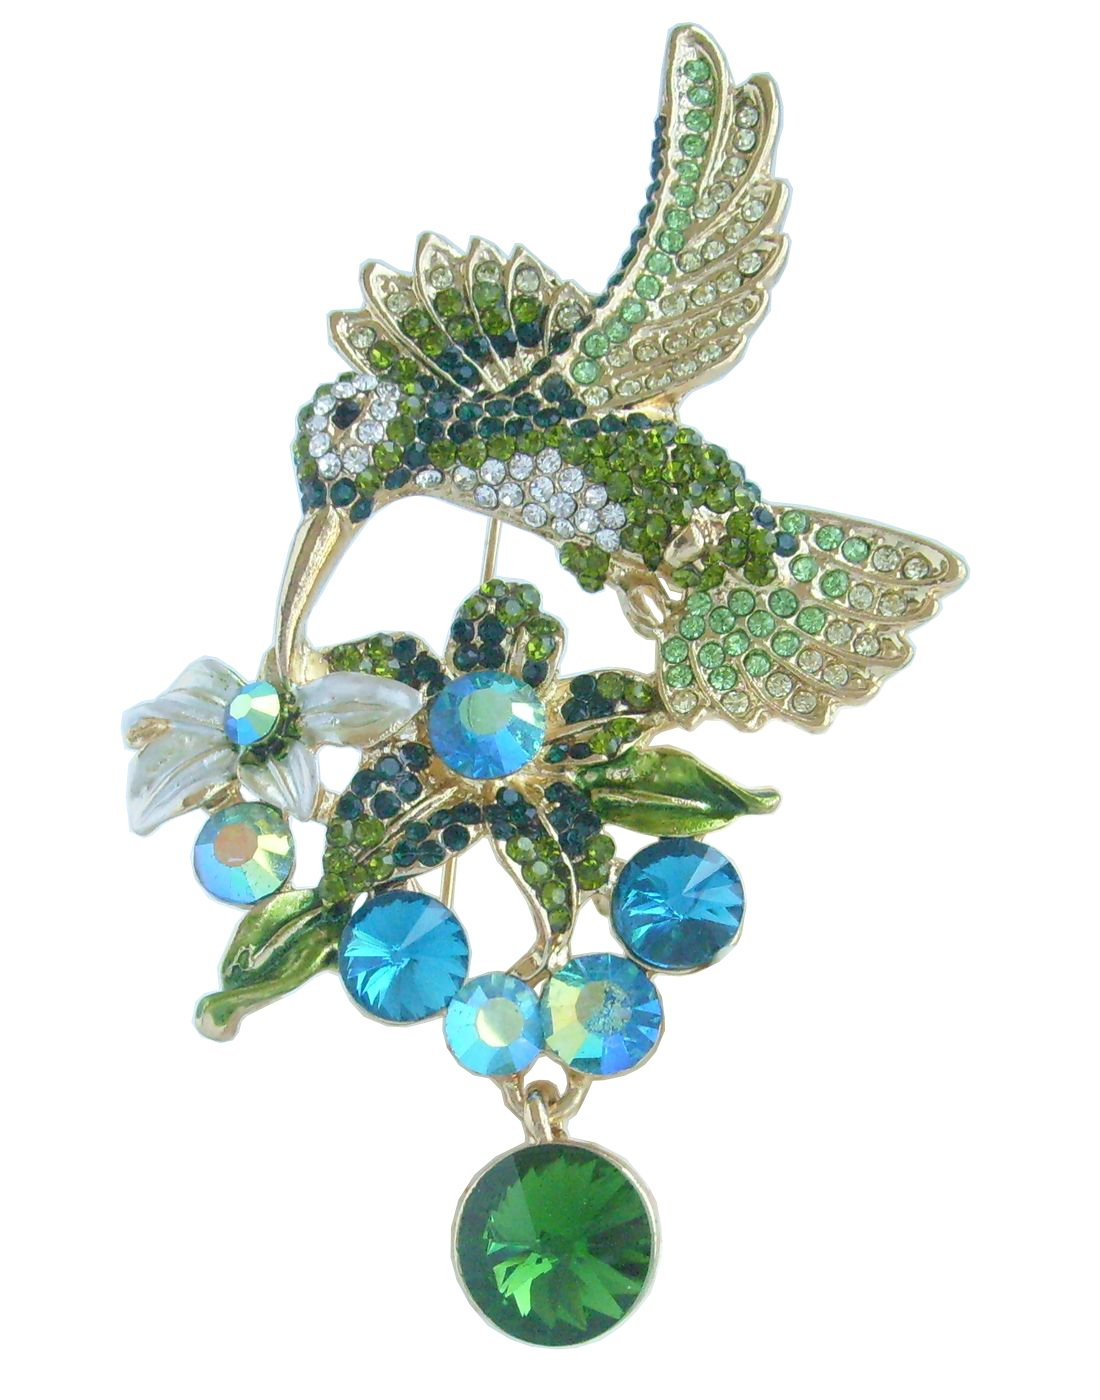 Sindary Pretty 3.54'' Animal Pendant Hummingbird Brooch Pin Rhinestone Crystal BZ6385 (Gold-Tone Green)